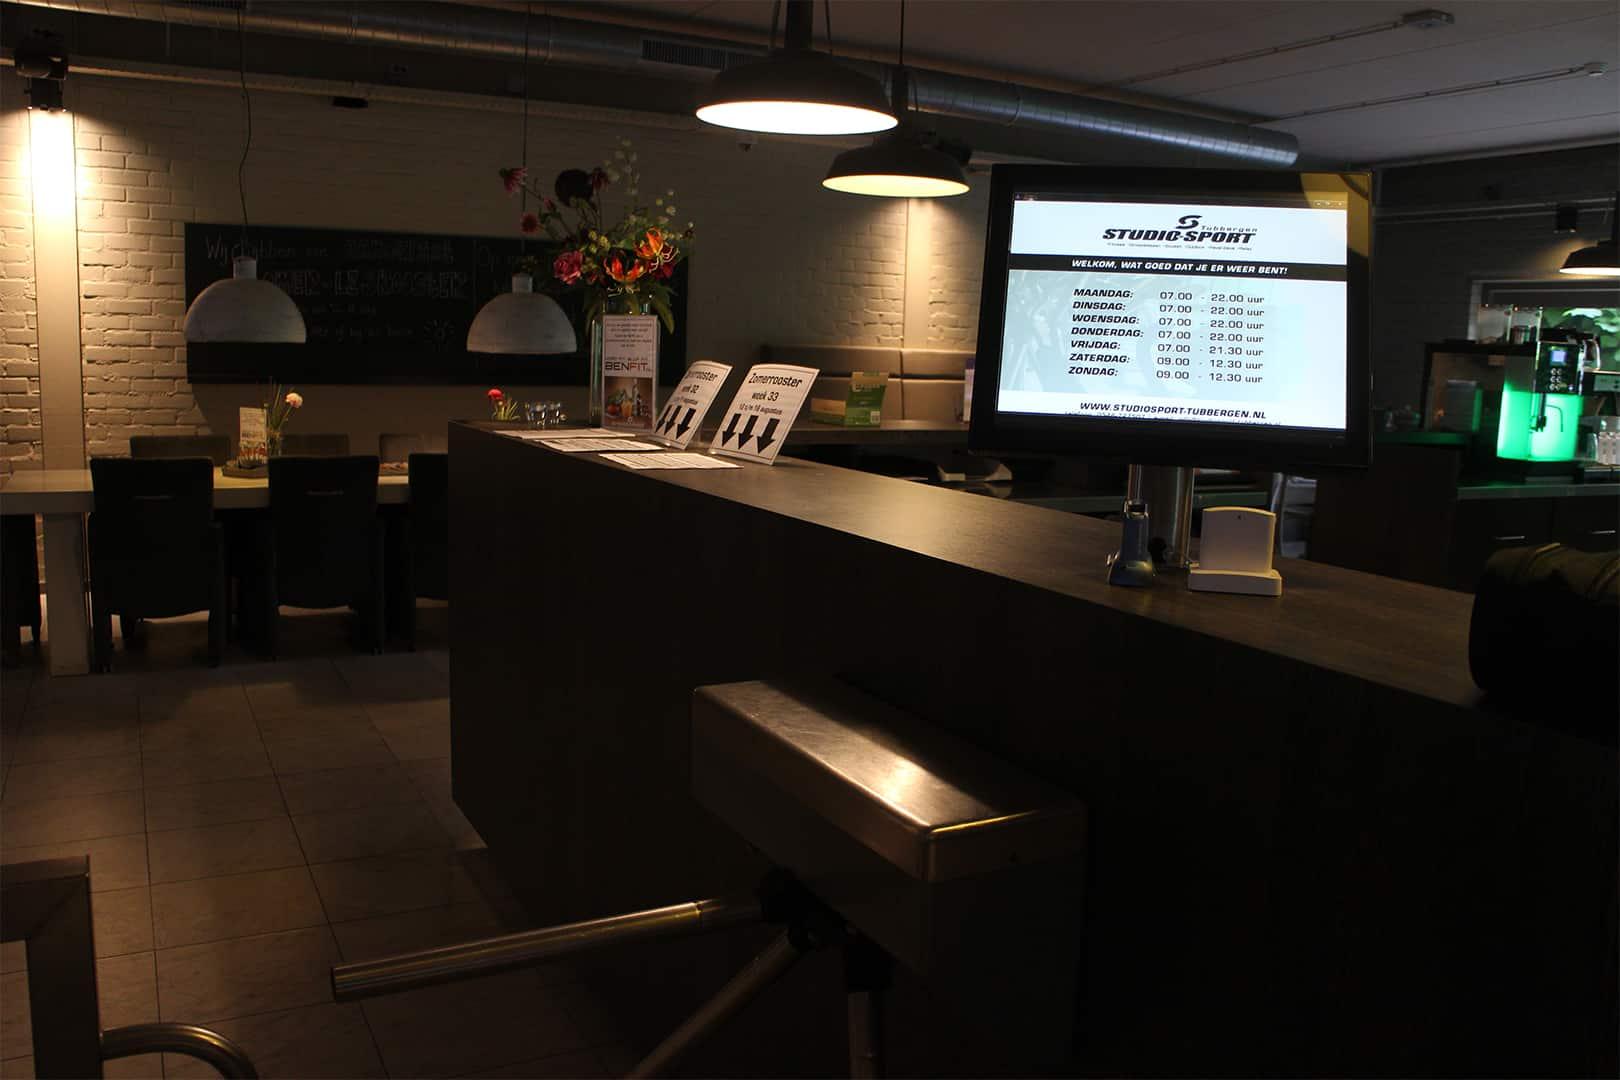 Bar Studiosport Tubbergen 109